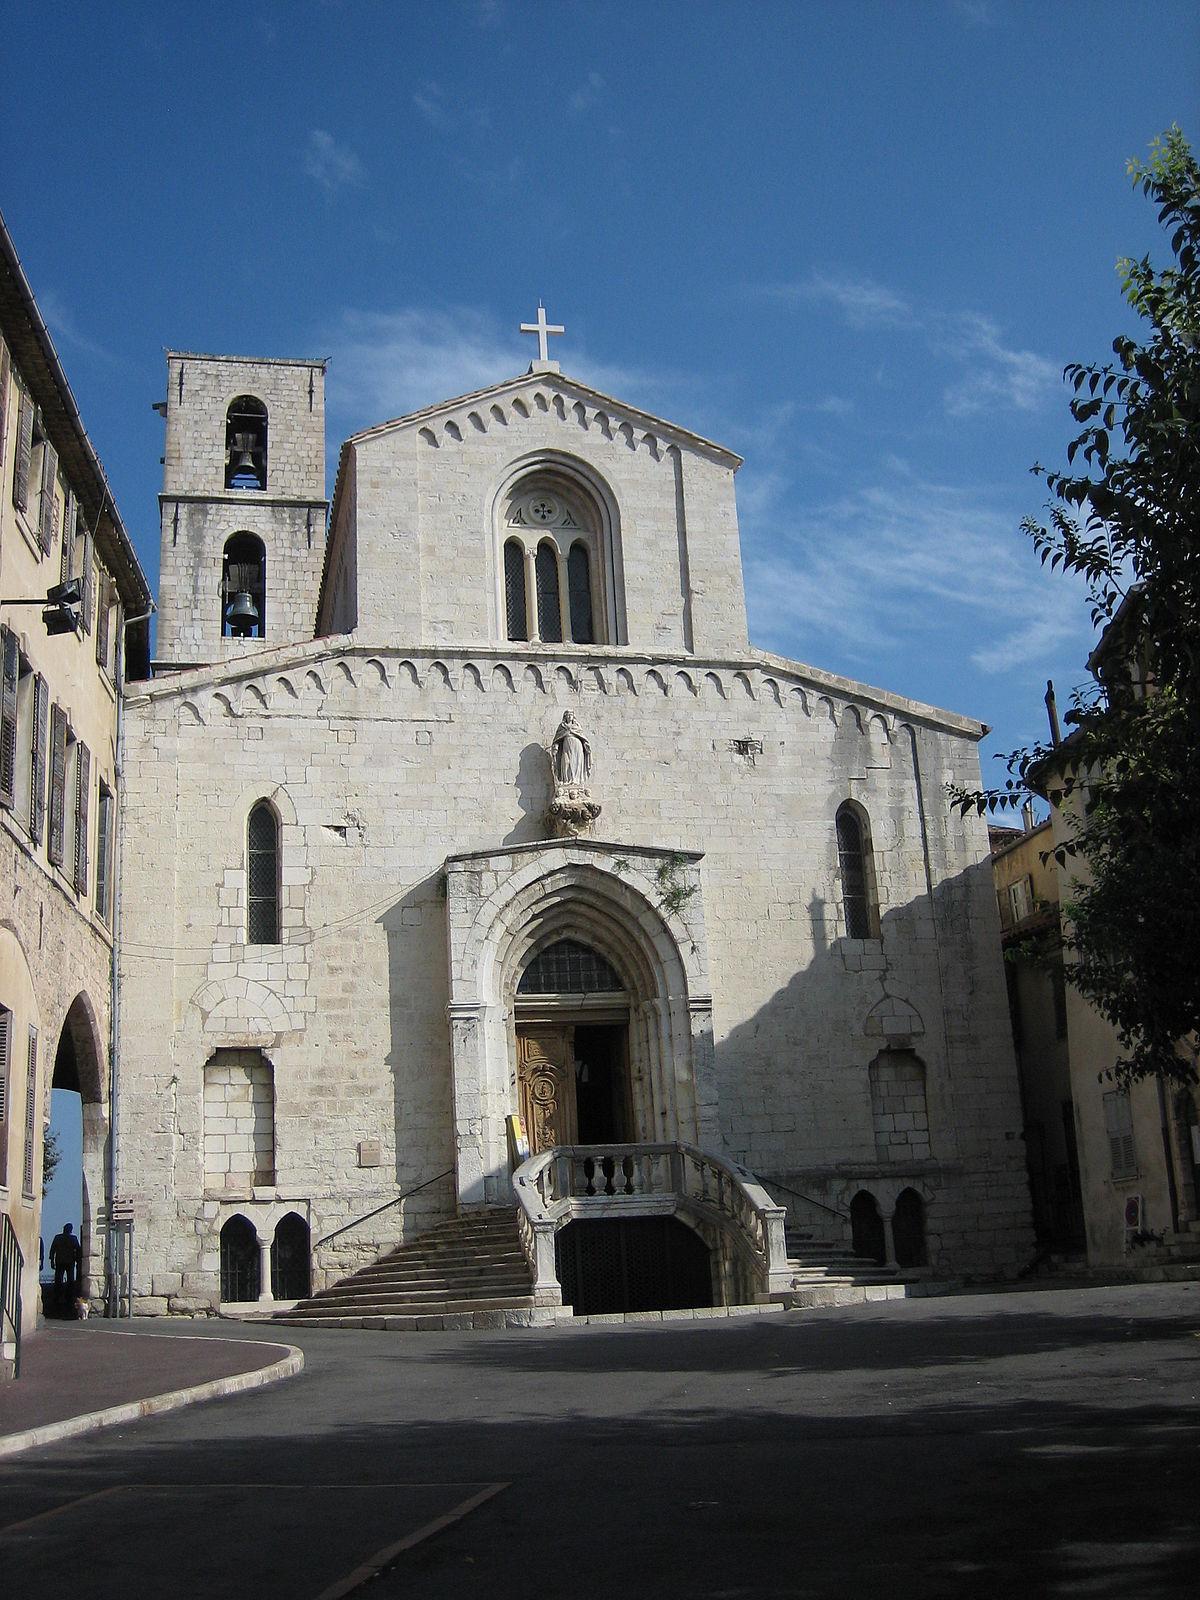 Grasse cathedral wikipedia - Office du tourisme de grasse ...